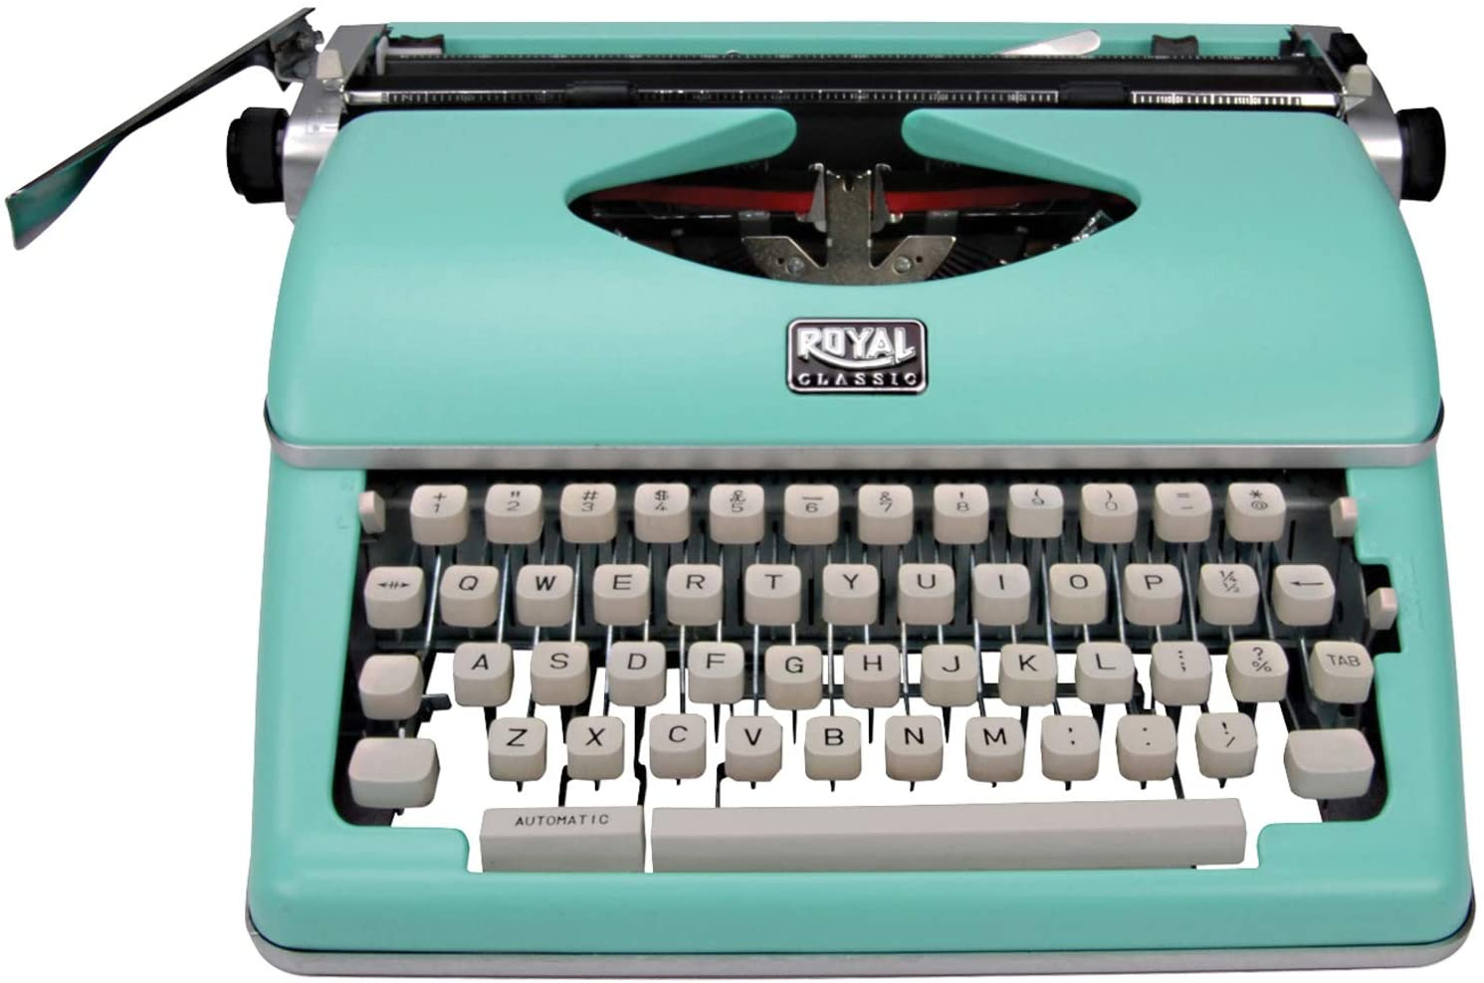 Royal 79101T ふるさと割 Classic Manual Metal 全国一律送料無料 Typewriter 88 44 and Symb Keys